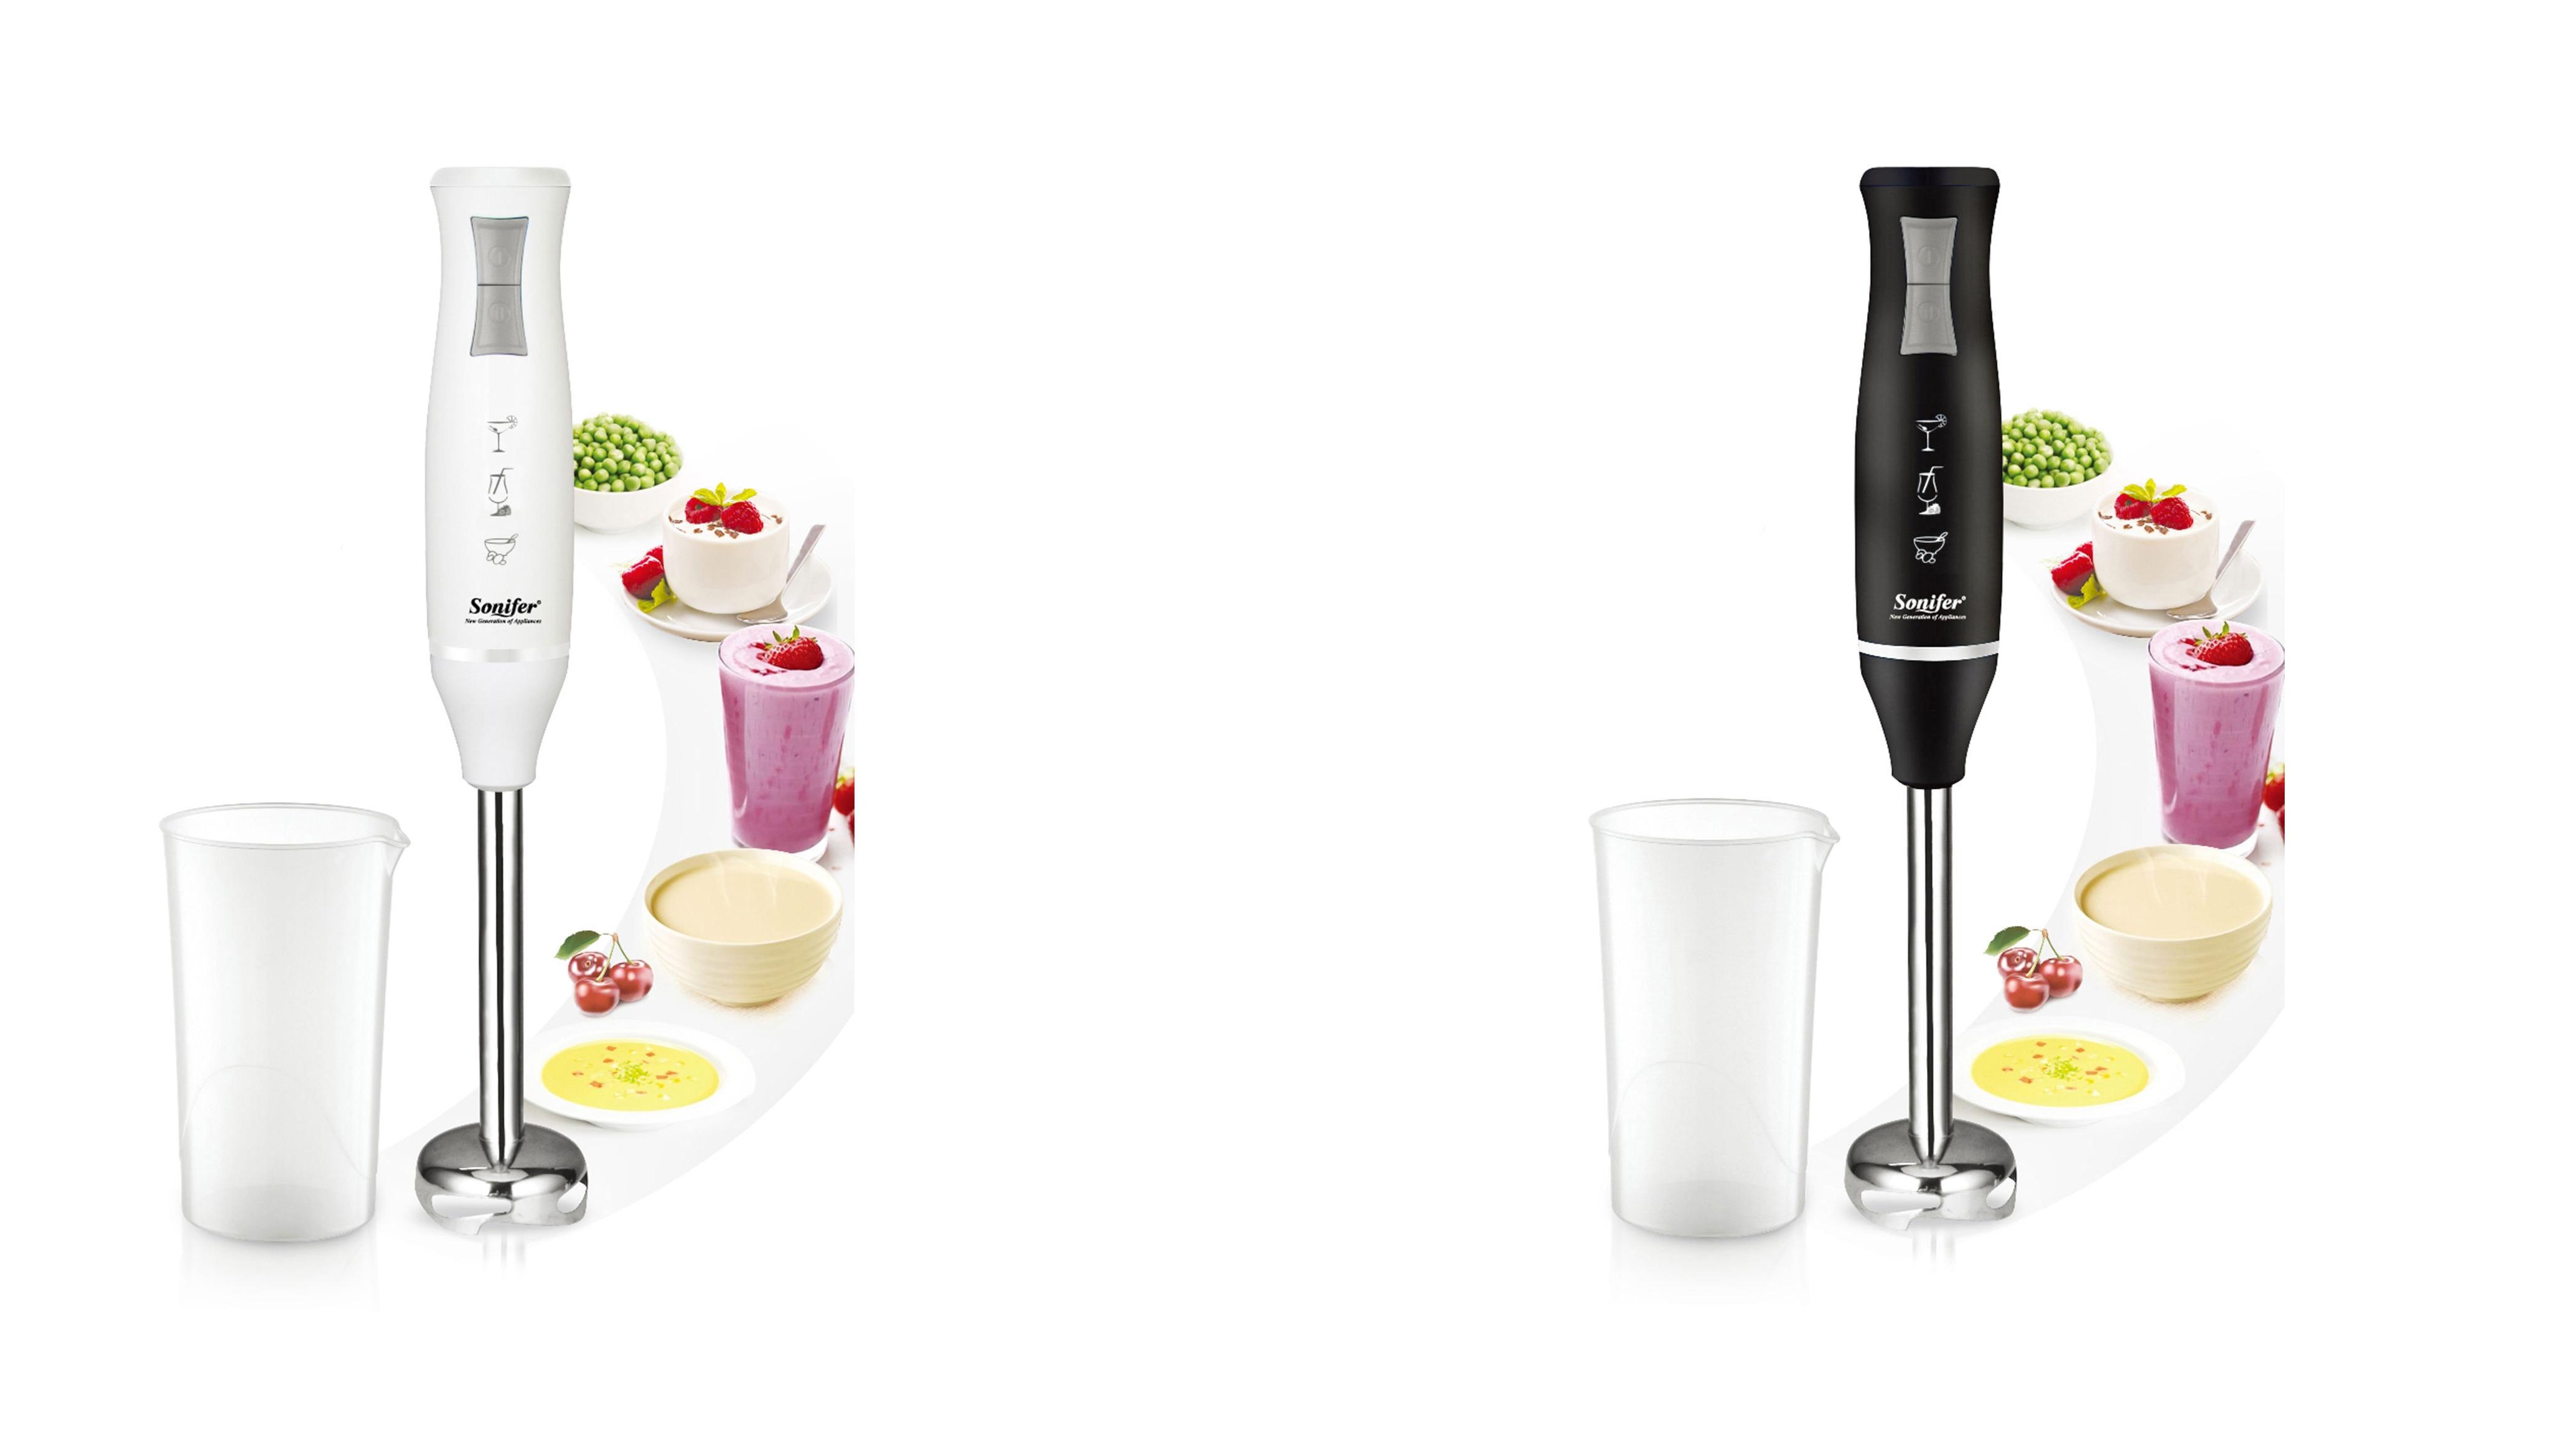 H8c3cfeaa115b47c2a1f06f5d957979da7 400W Colorful 2 Speeds Electric Food Blender Mixer Kitchen Detachable Hand Blender Egg Beater Vegetable Stand Blend Sonifer